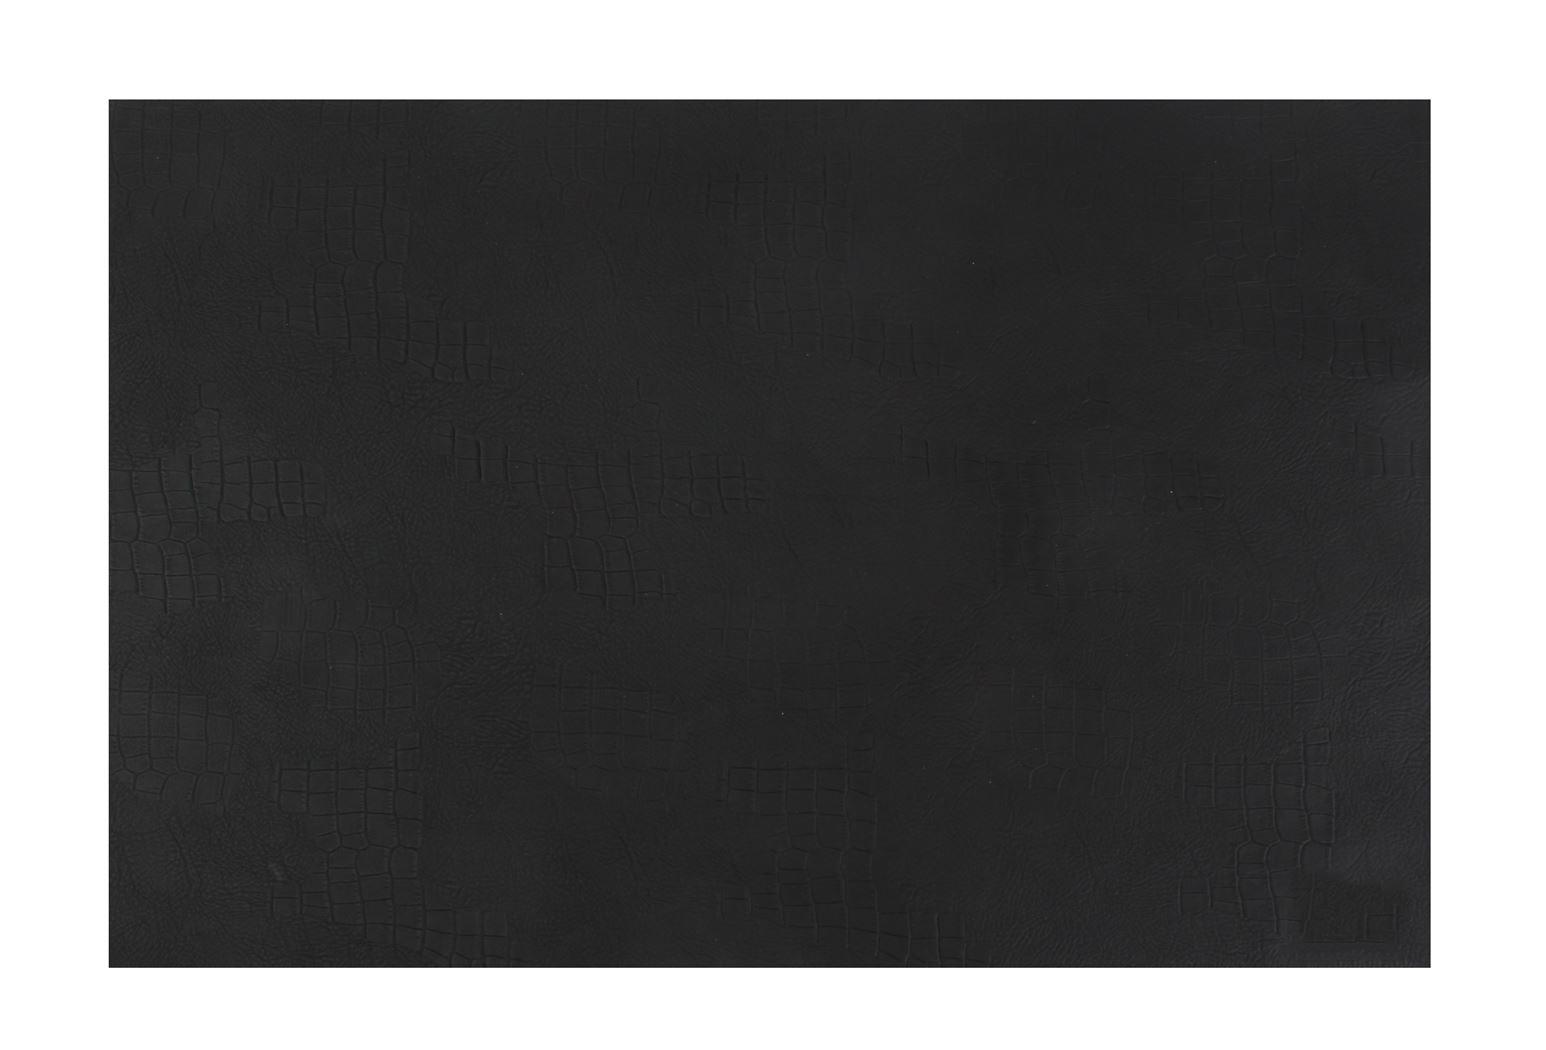 placemat lederlook zwart